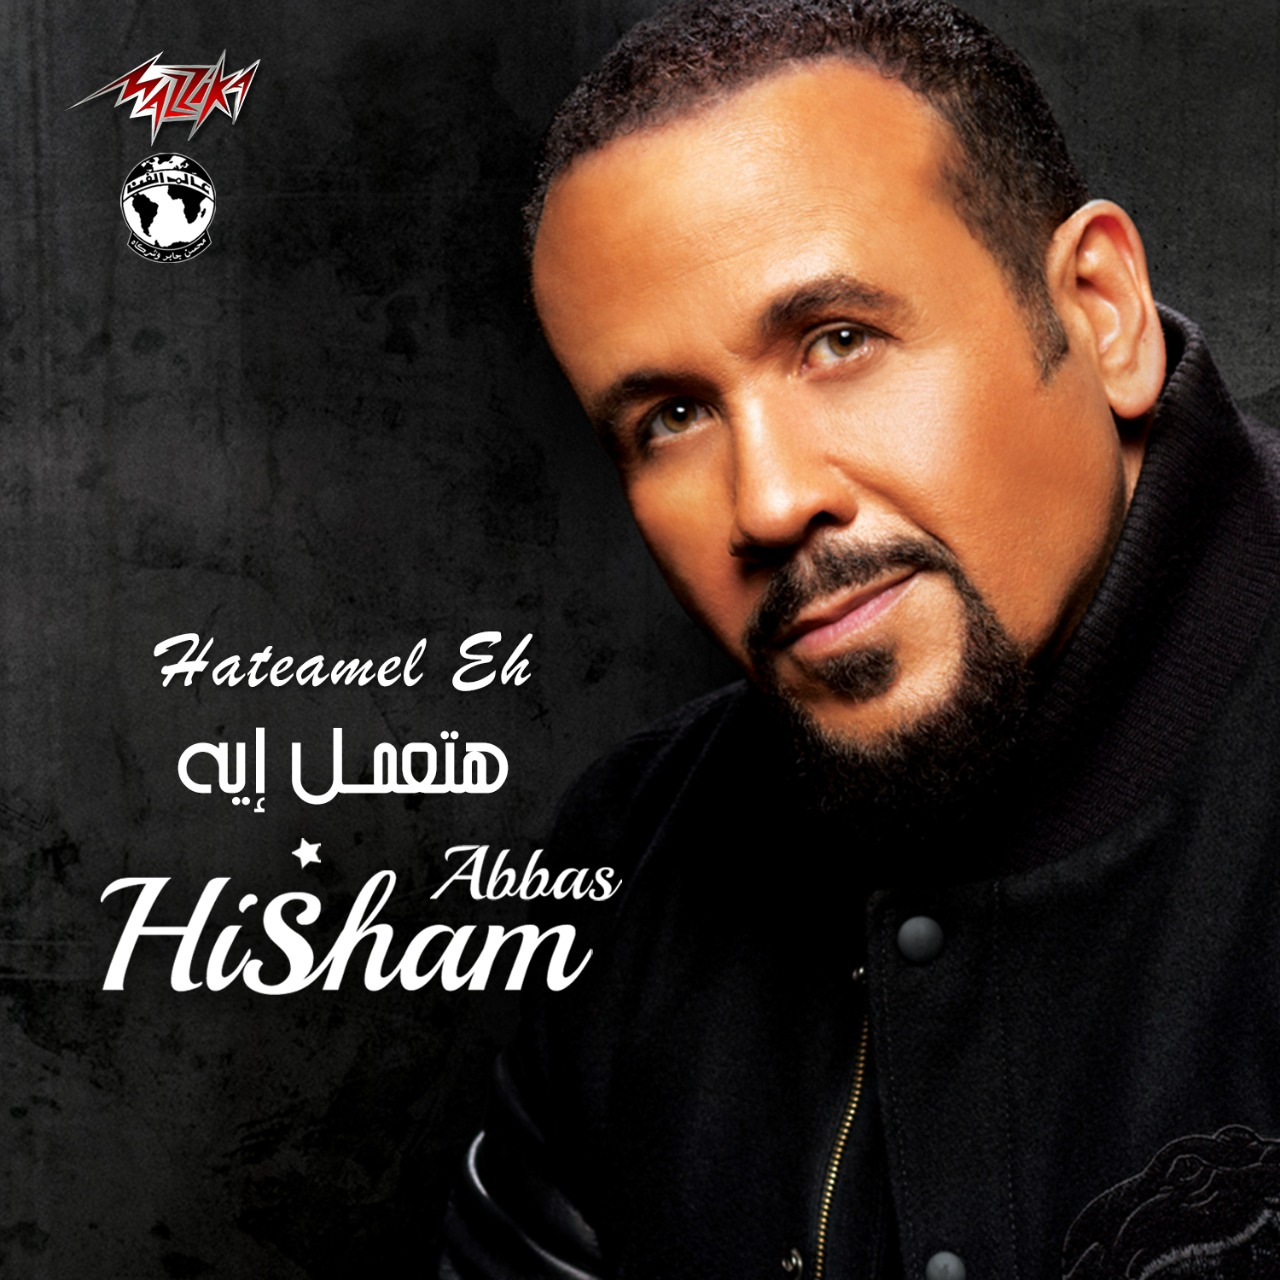 "54940fdc e78e 43f7 92ba 563846dd3ee5 - هشام عباس يطرح أغنية الجديدة بعنوان ""هتعمل إيه""|فيديو"